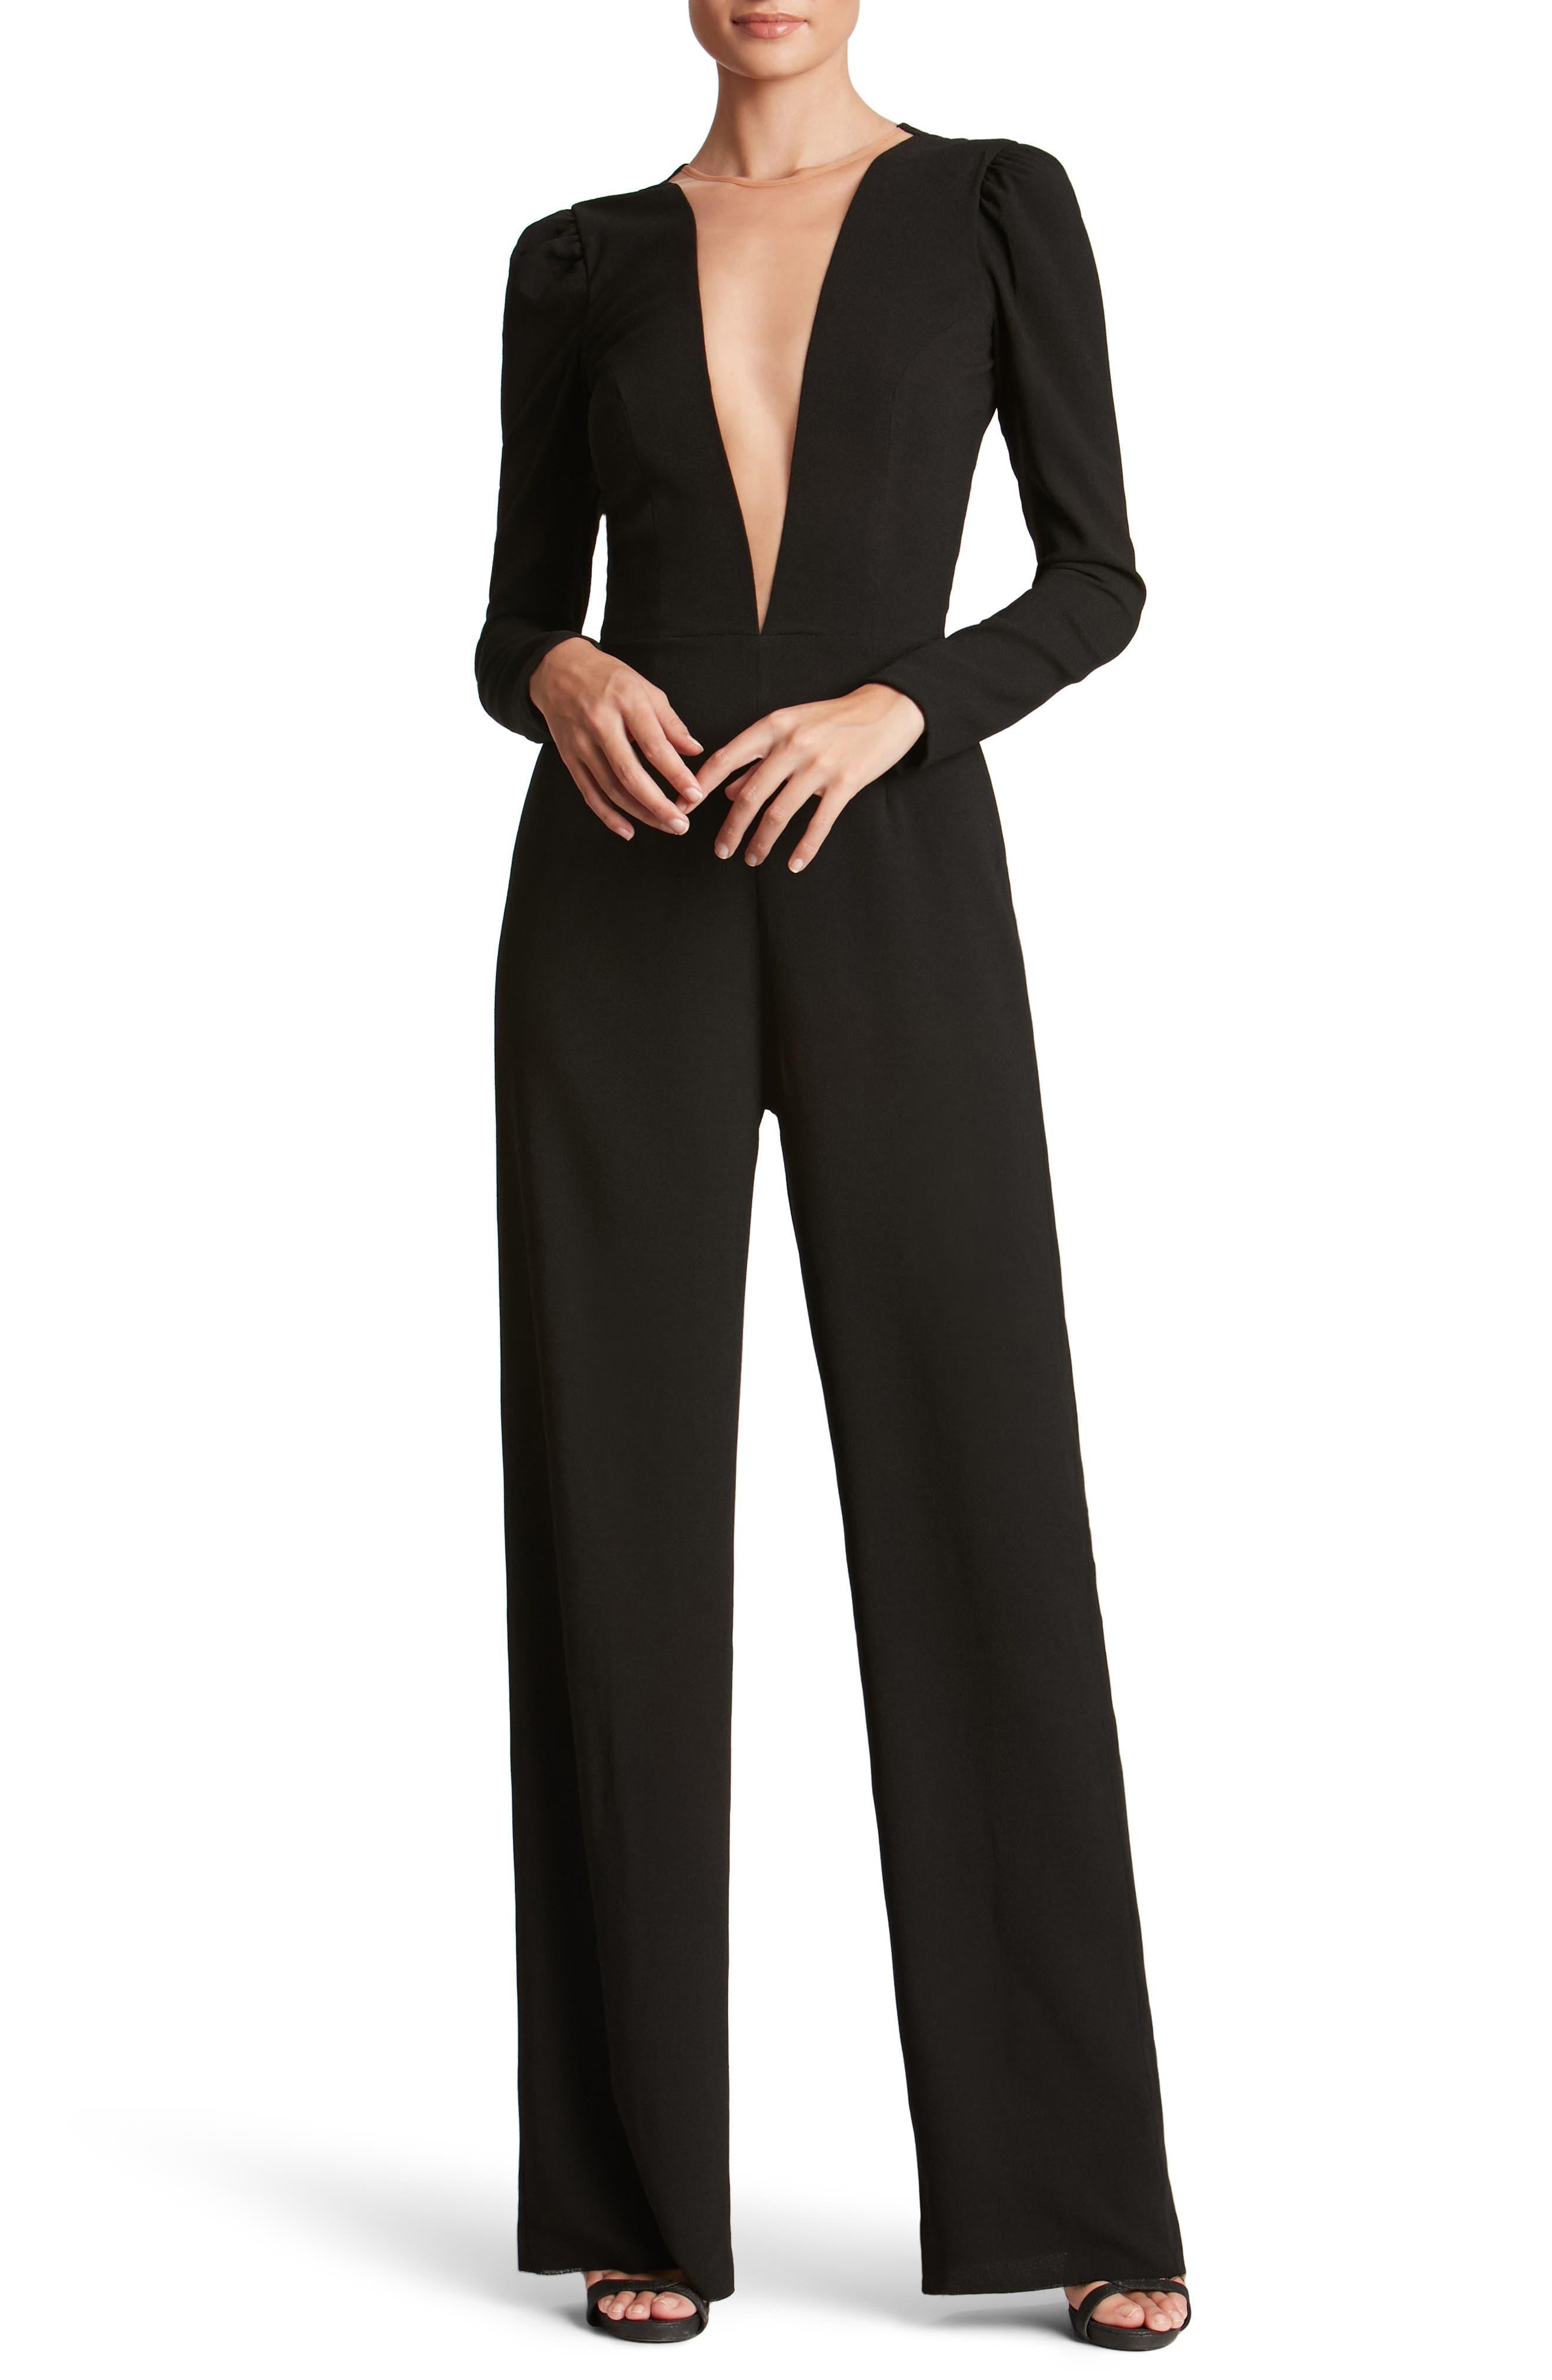 Main Image - Dress the Population Drew Plunging Illusion Jumpsuit